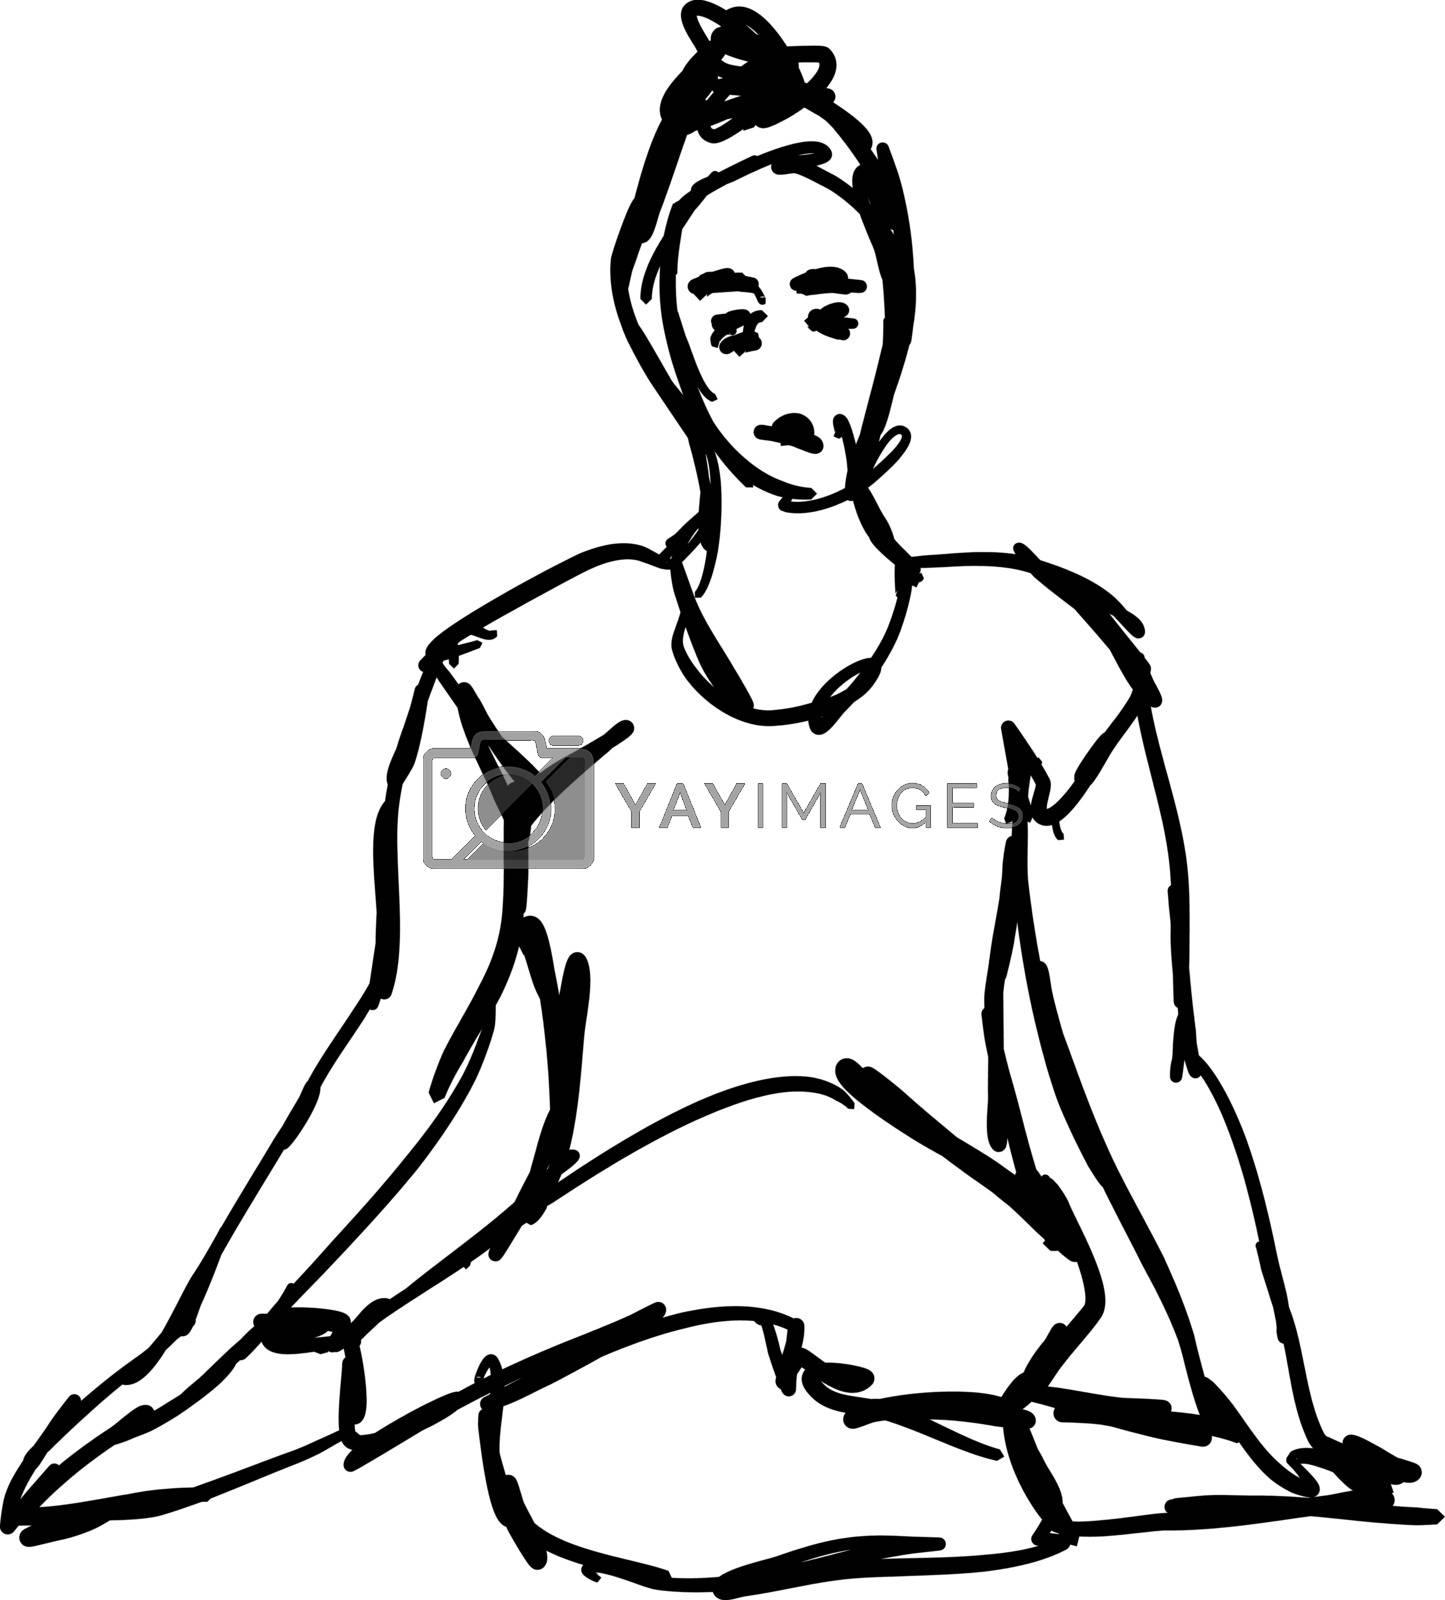 Yoga pose, illustration, vector on white background.